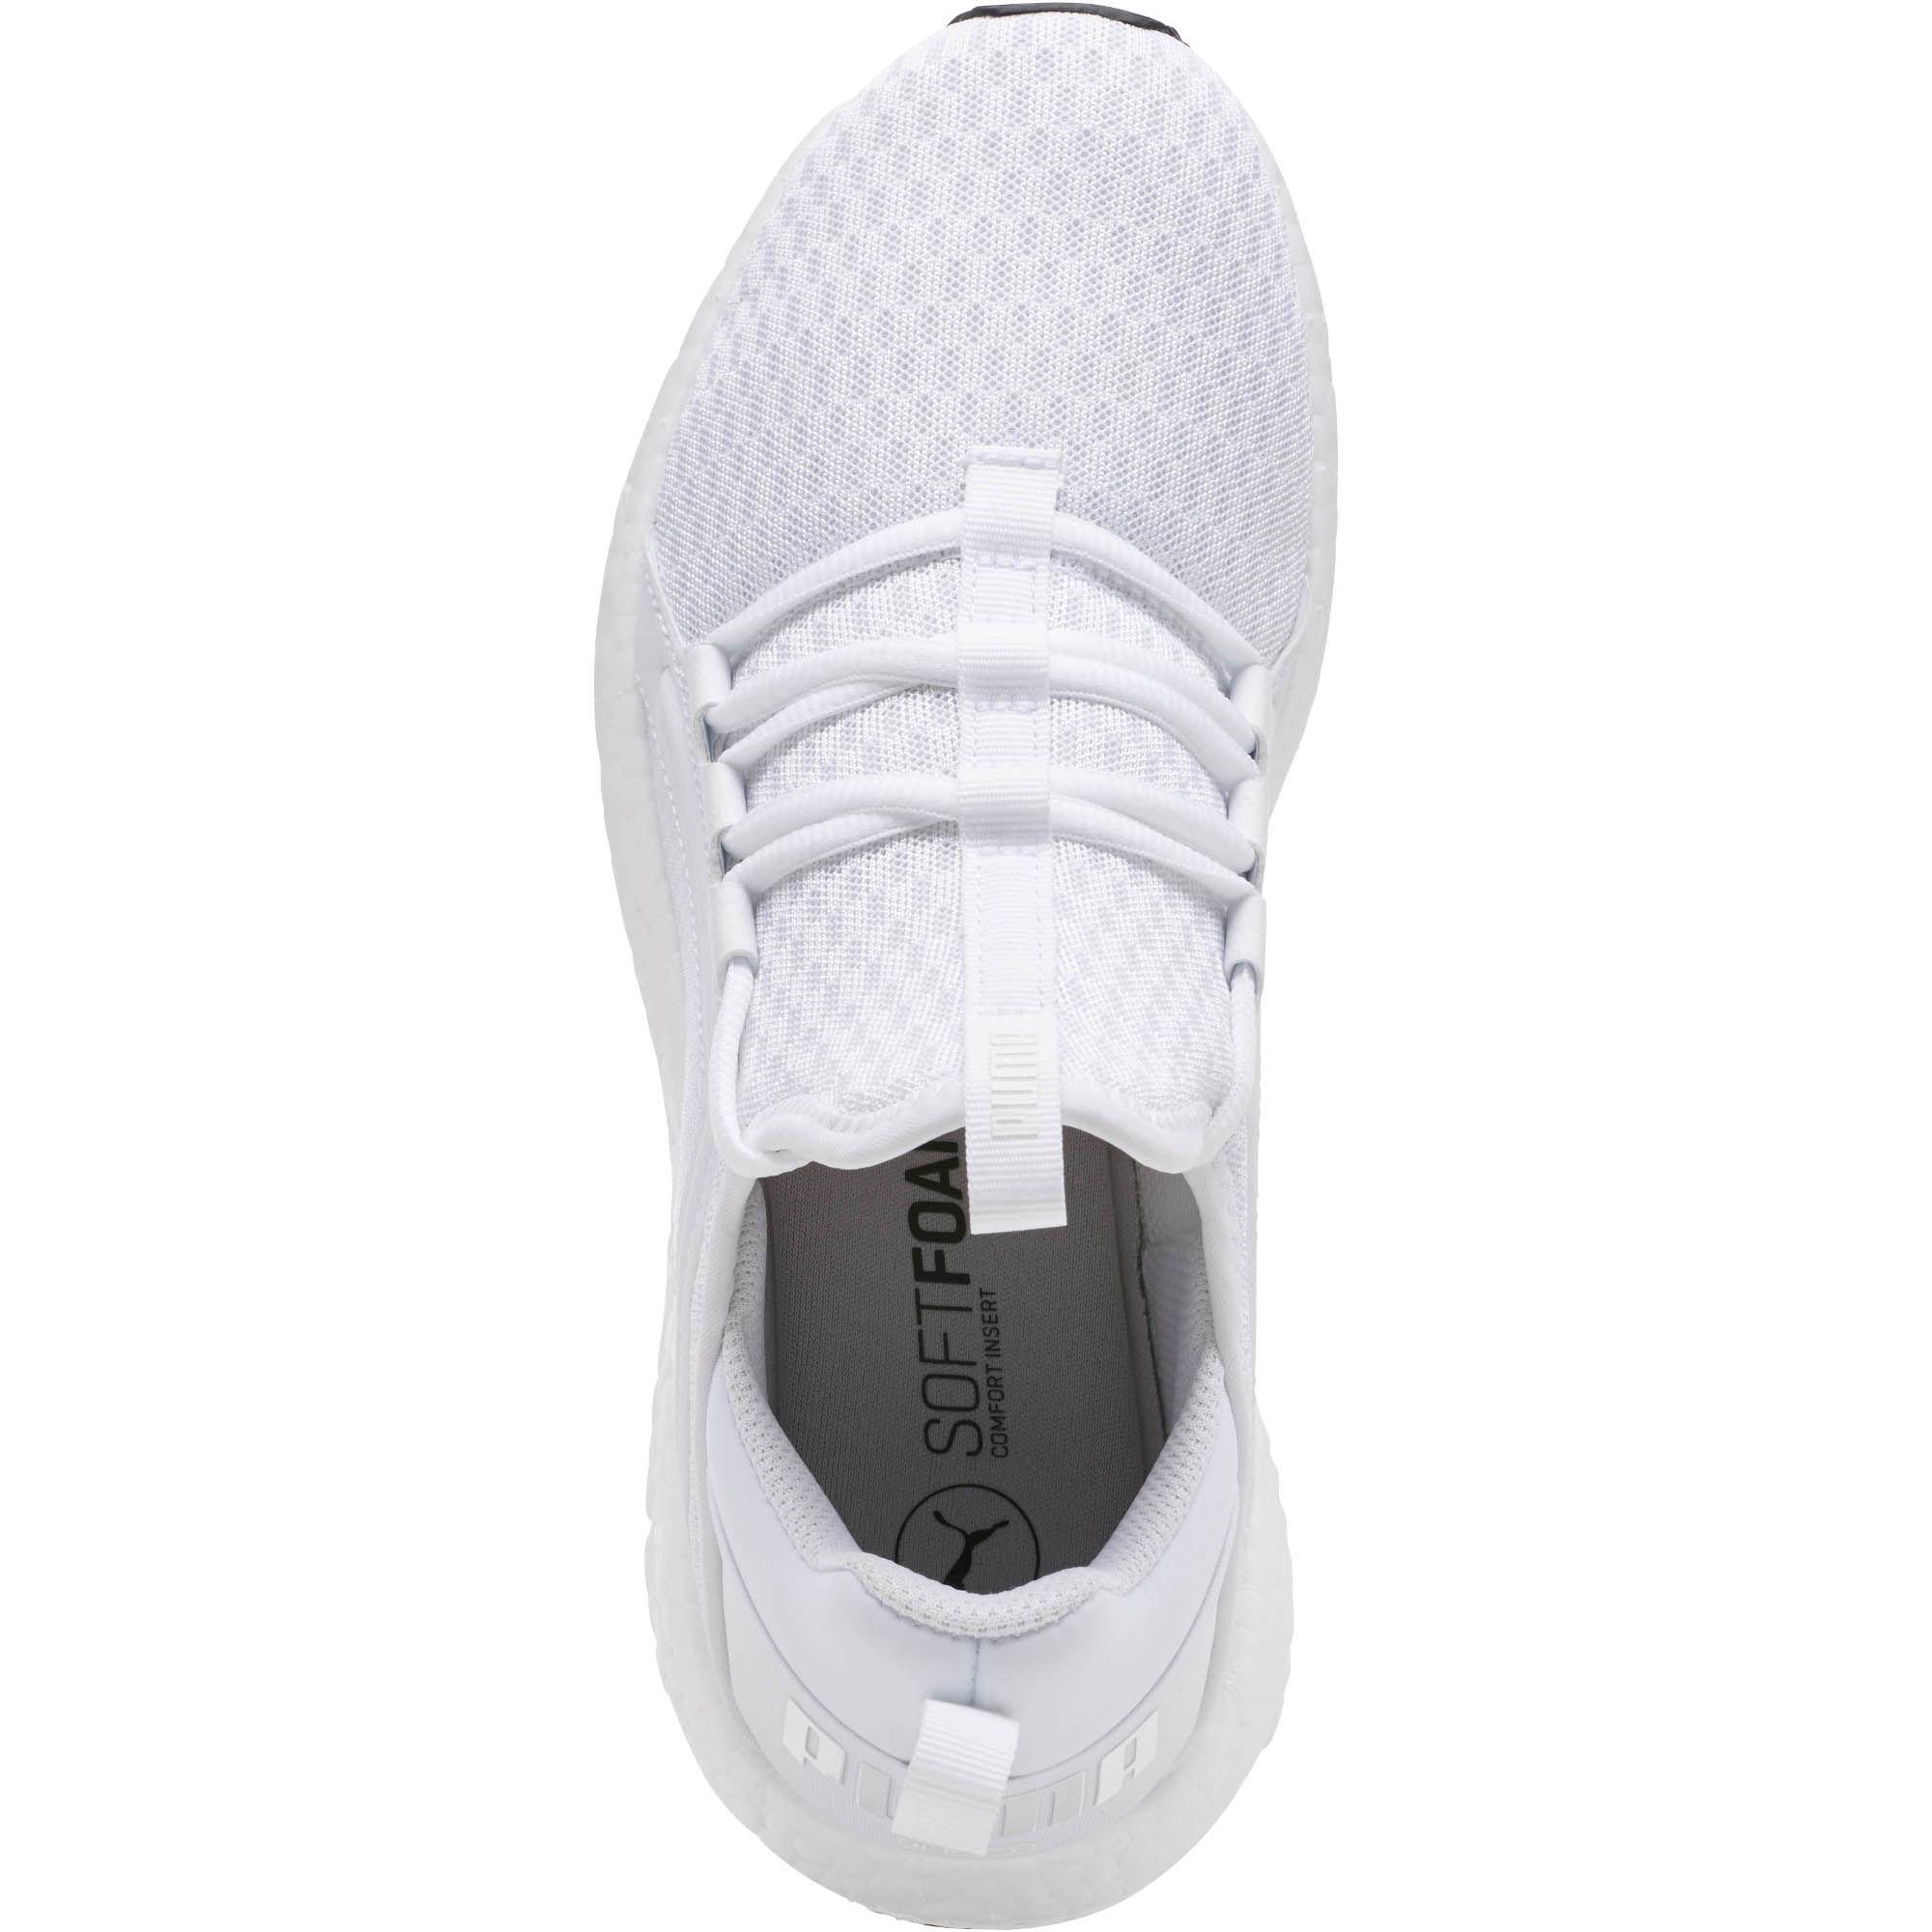 6f44019c47 PUMA White Mega Nrgy Trainers